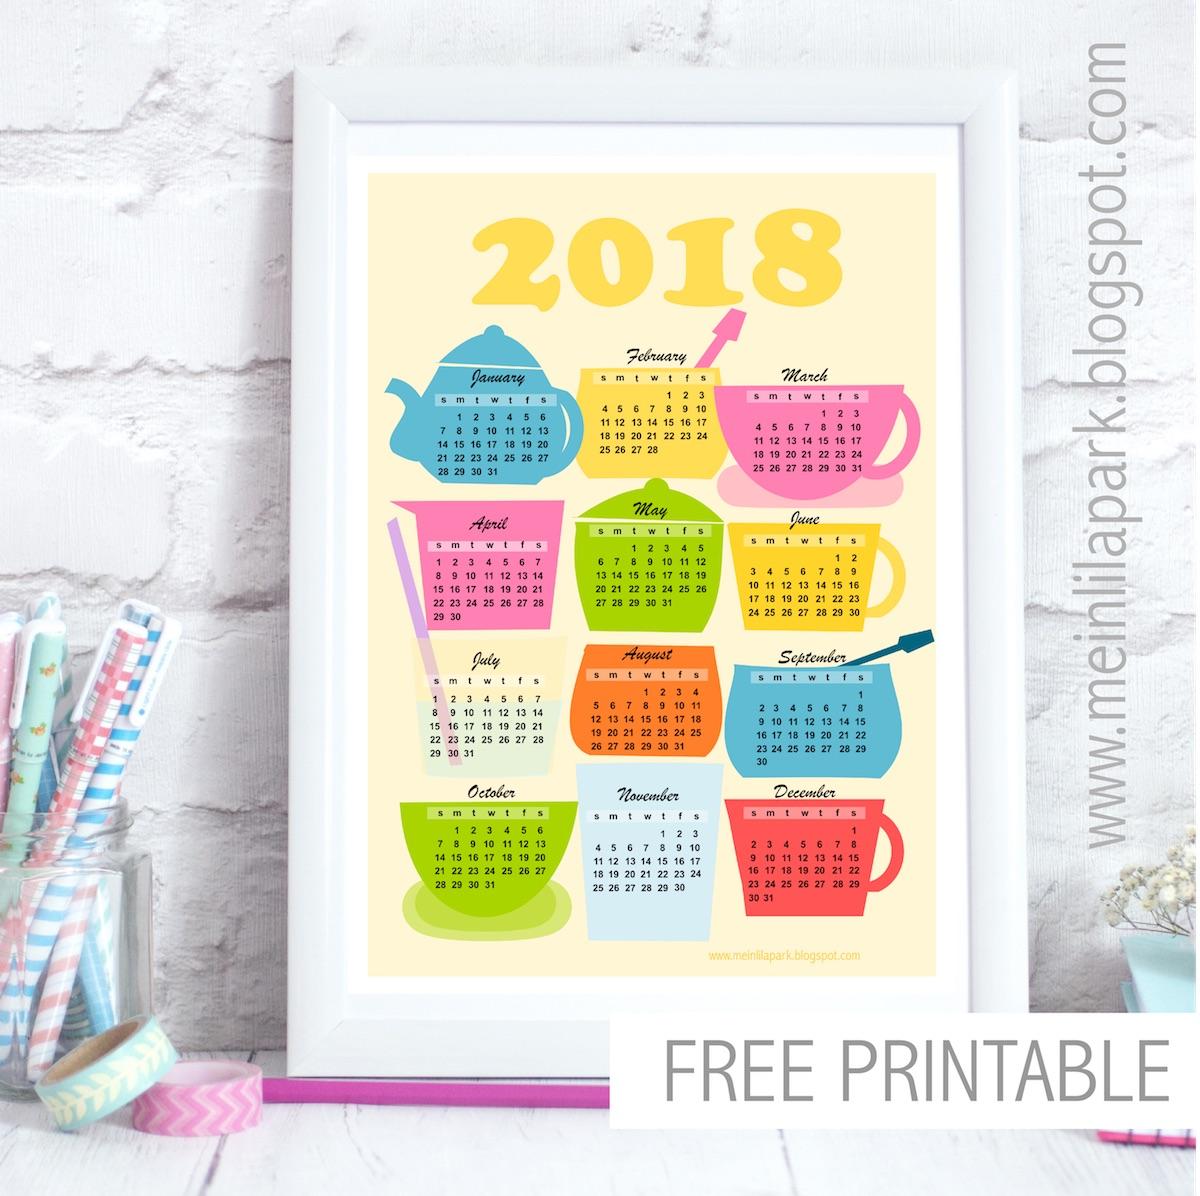 Free Printable 2018 Kitchen Calendar   Kalender   Freebie